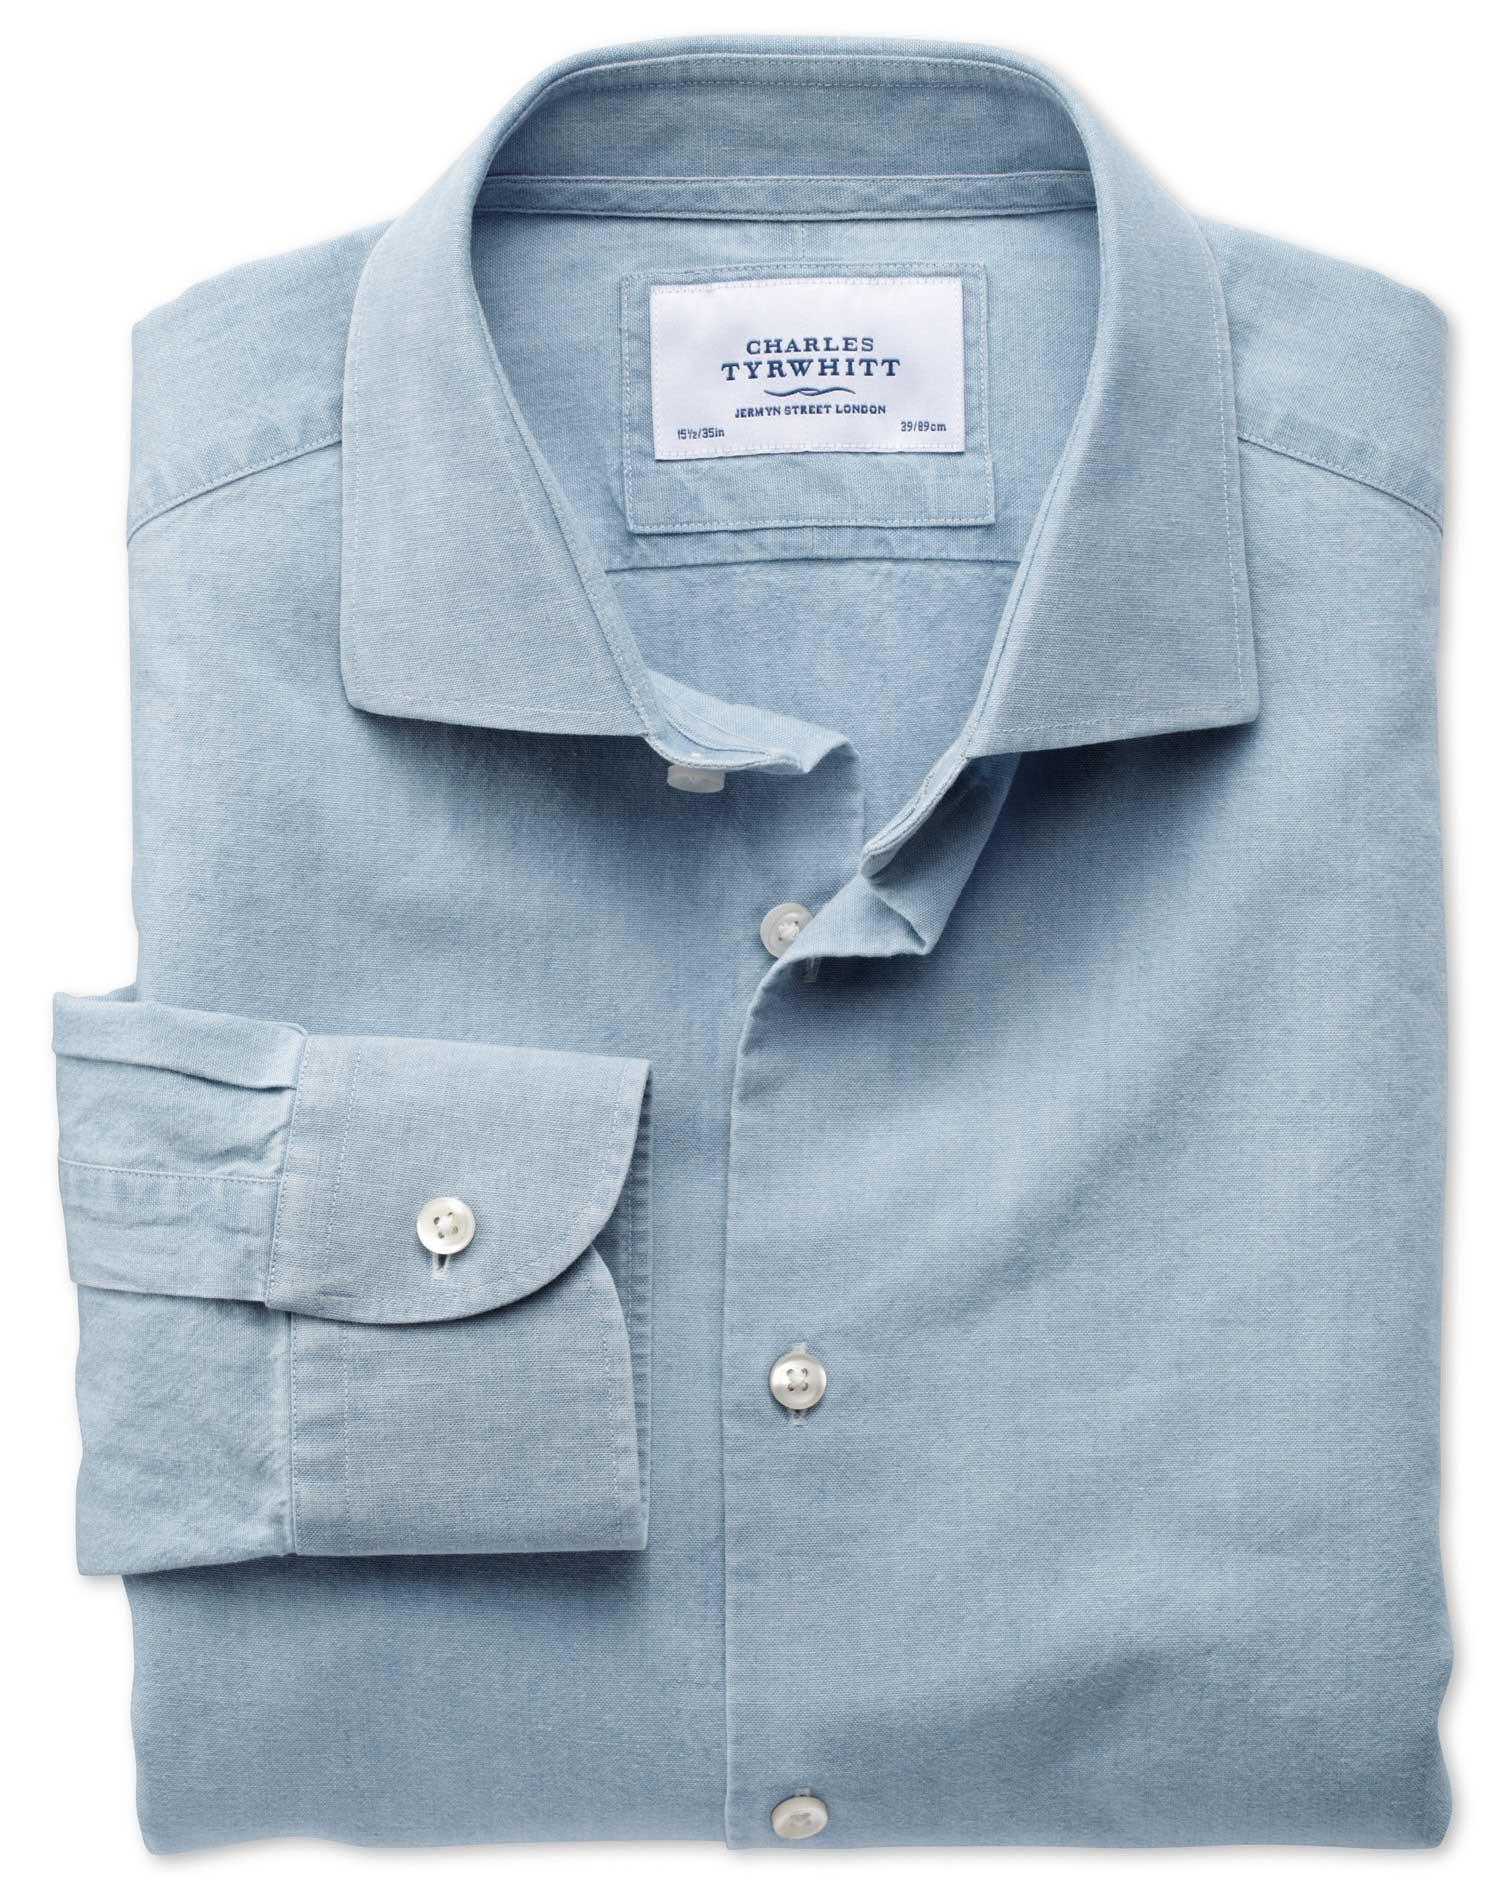 Slim Fit Semi-Cutaway Collar Business Casual Chambray Denim Blue Cotton Formal Shirt Single Cuff Siz